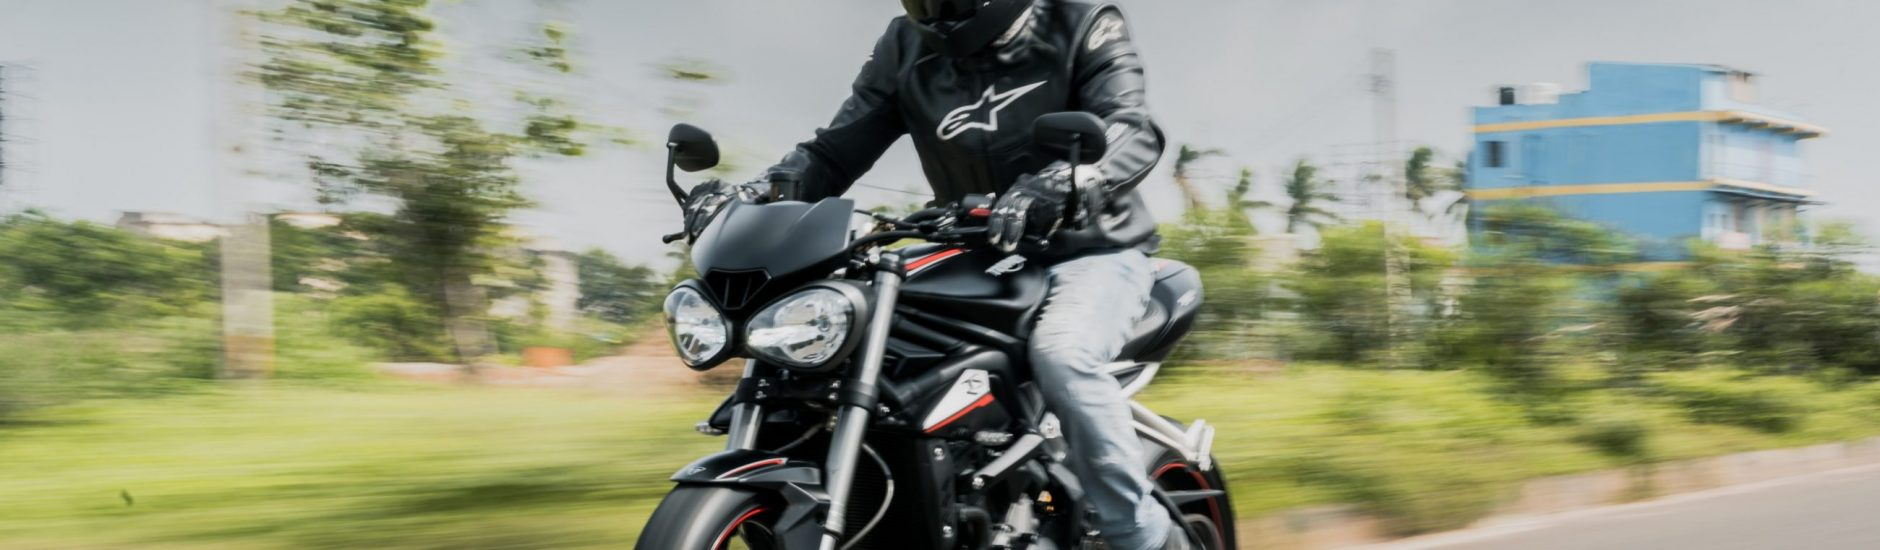 das motorbike training bridgwater